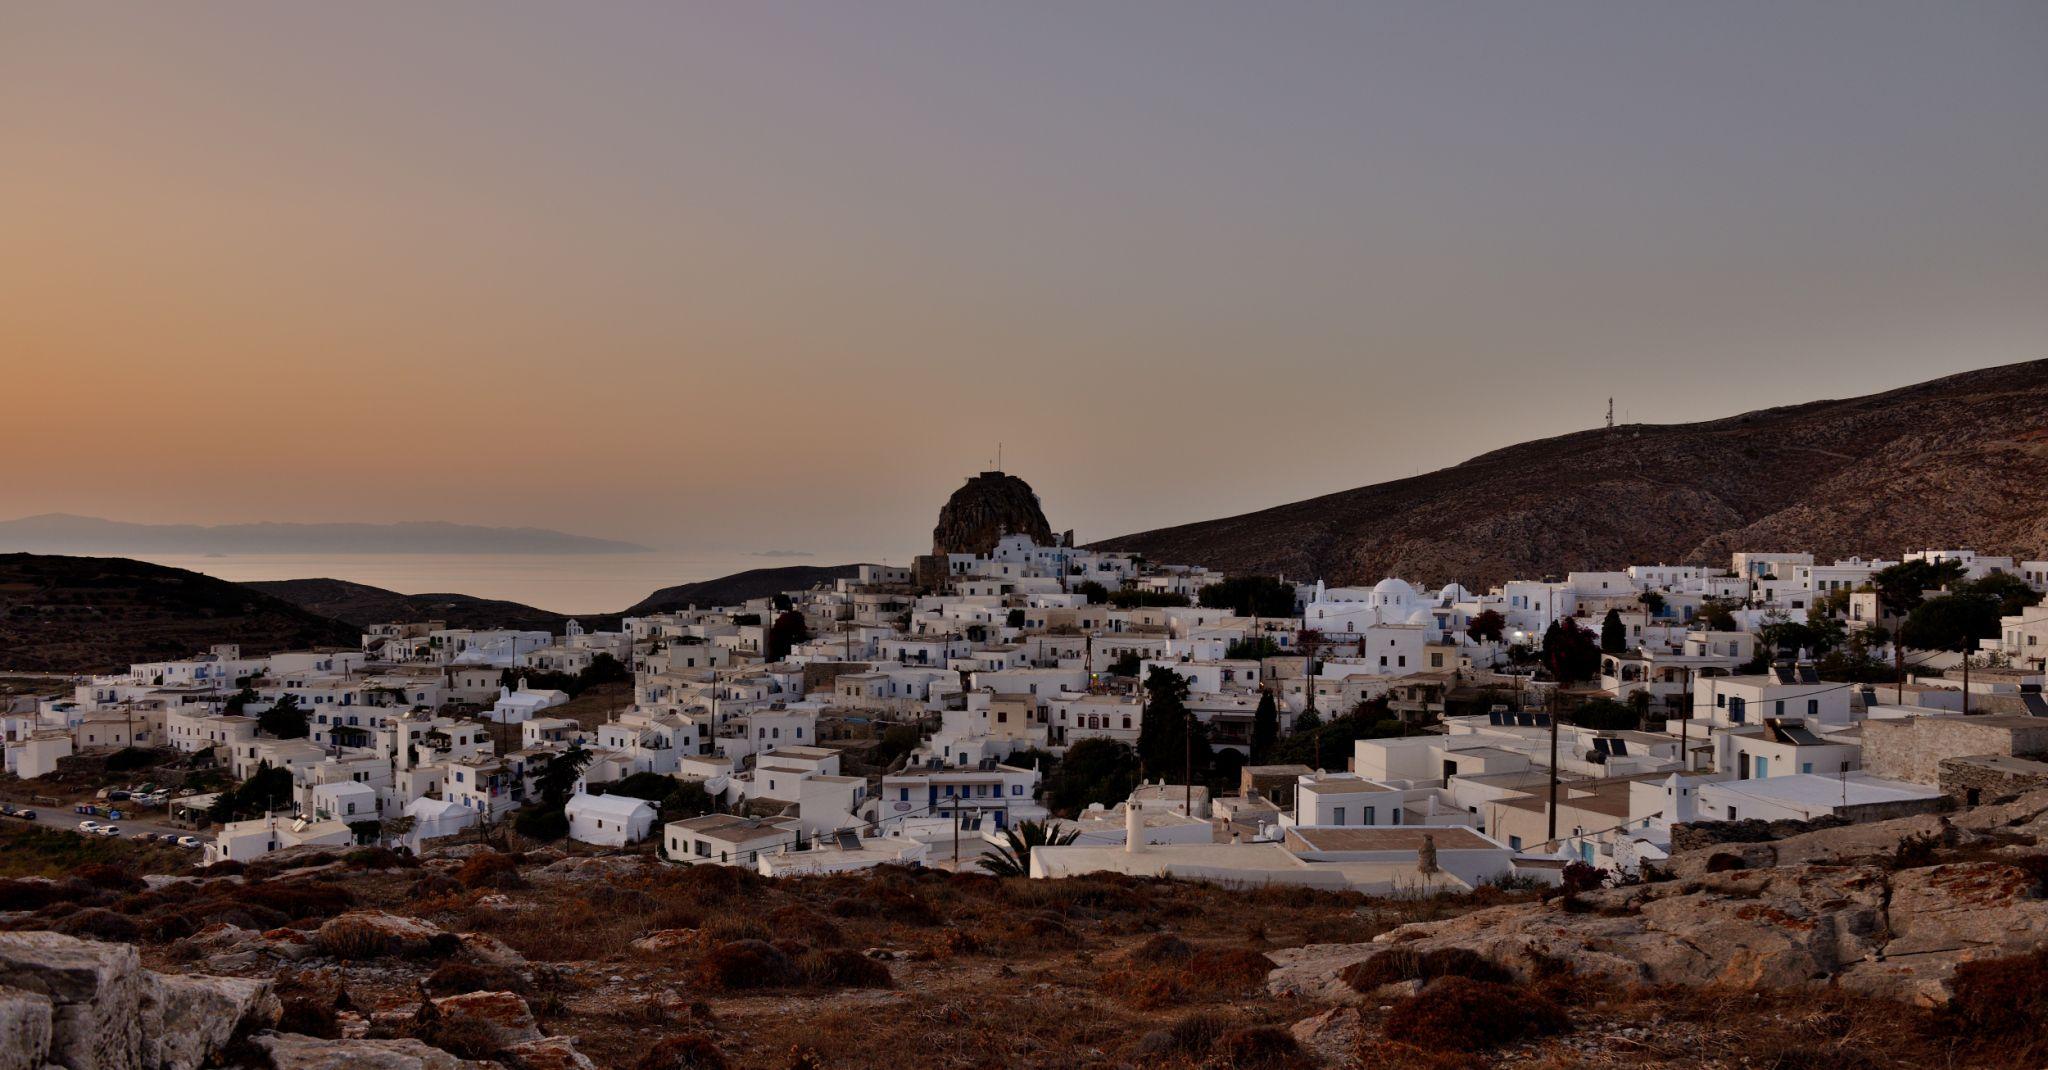 Amorgos town (chora) at sunset, Greece